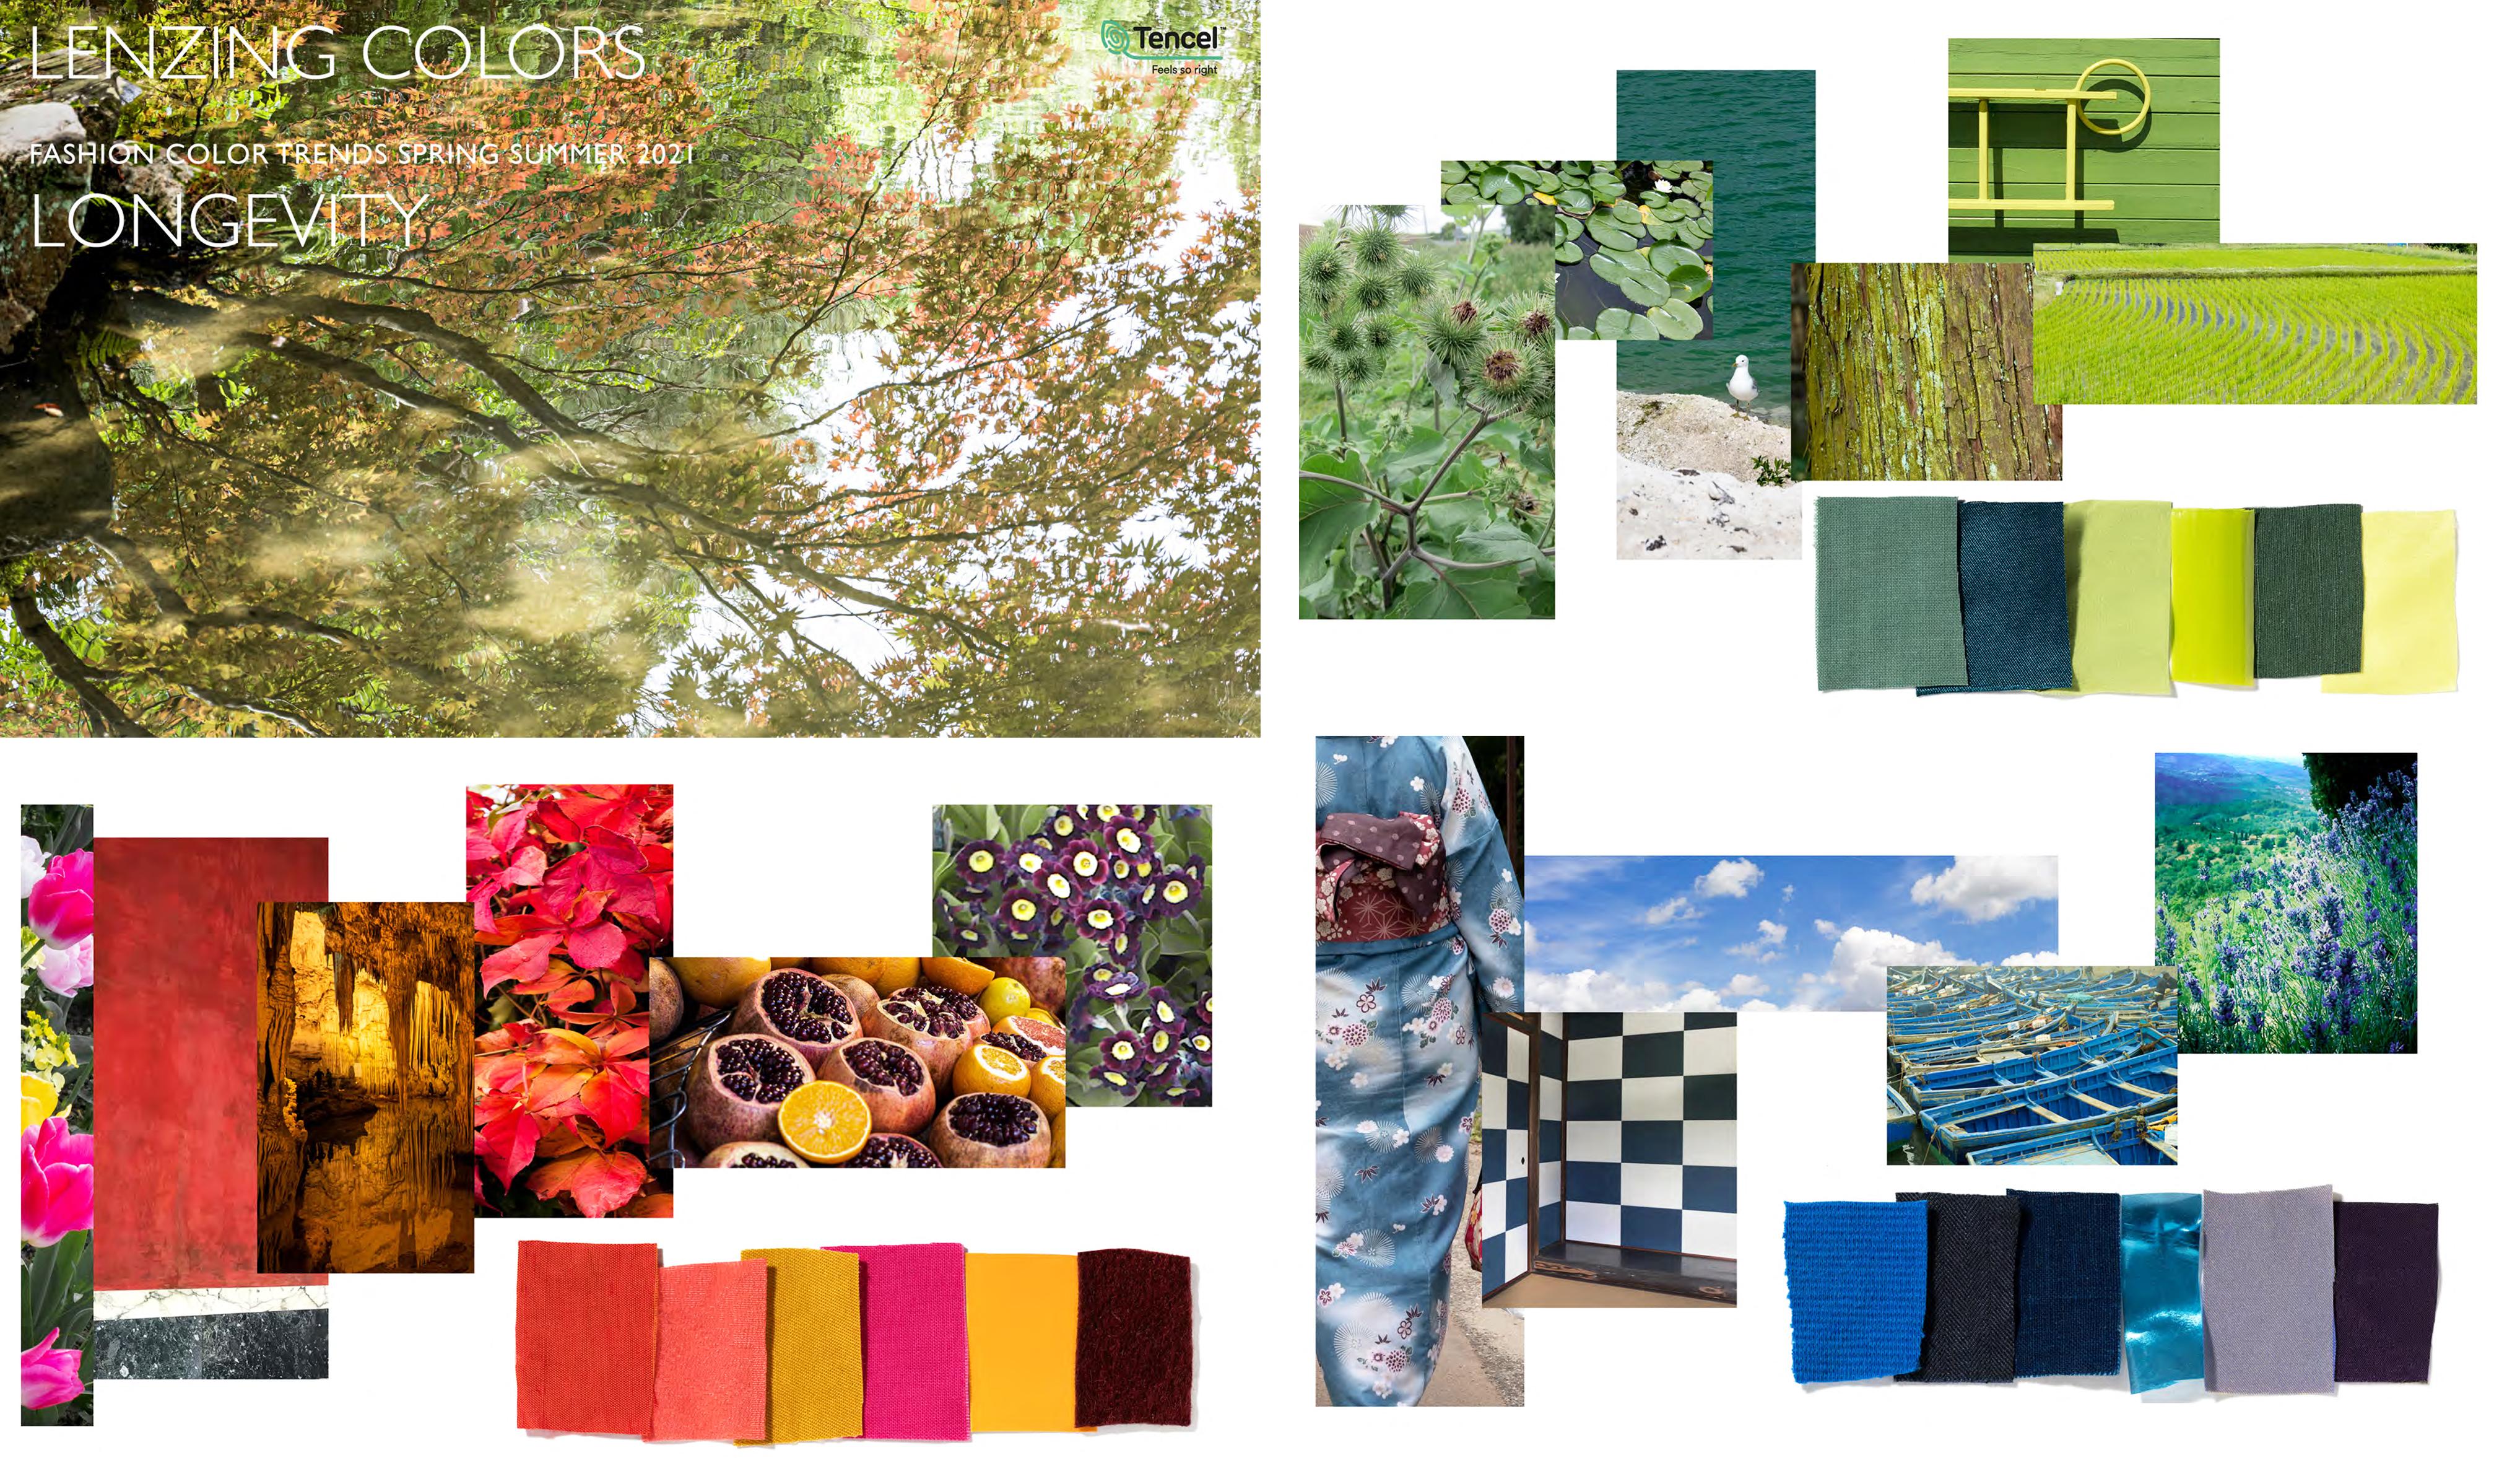 Lenzing Color Trends Spring/Summer 8 - Fashion Trendsetter